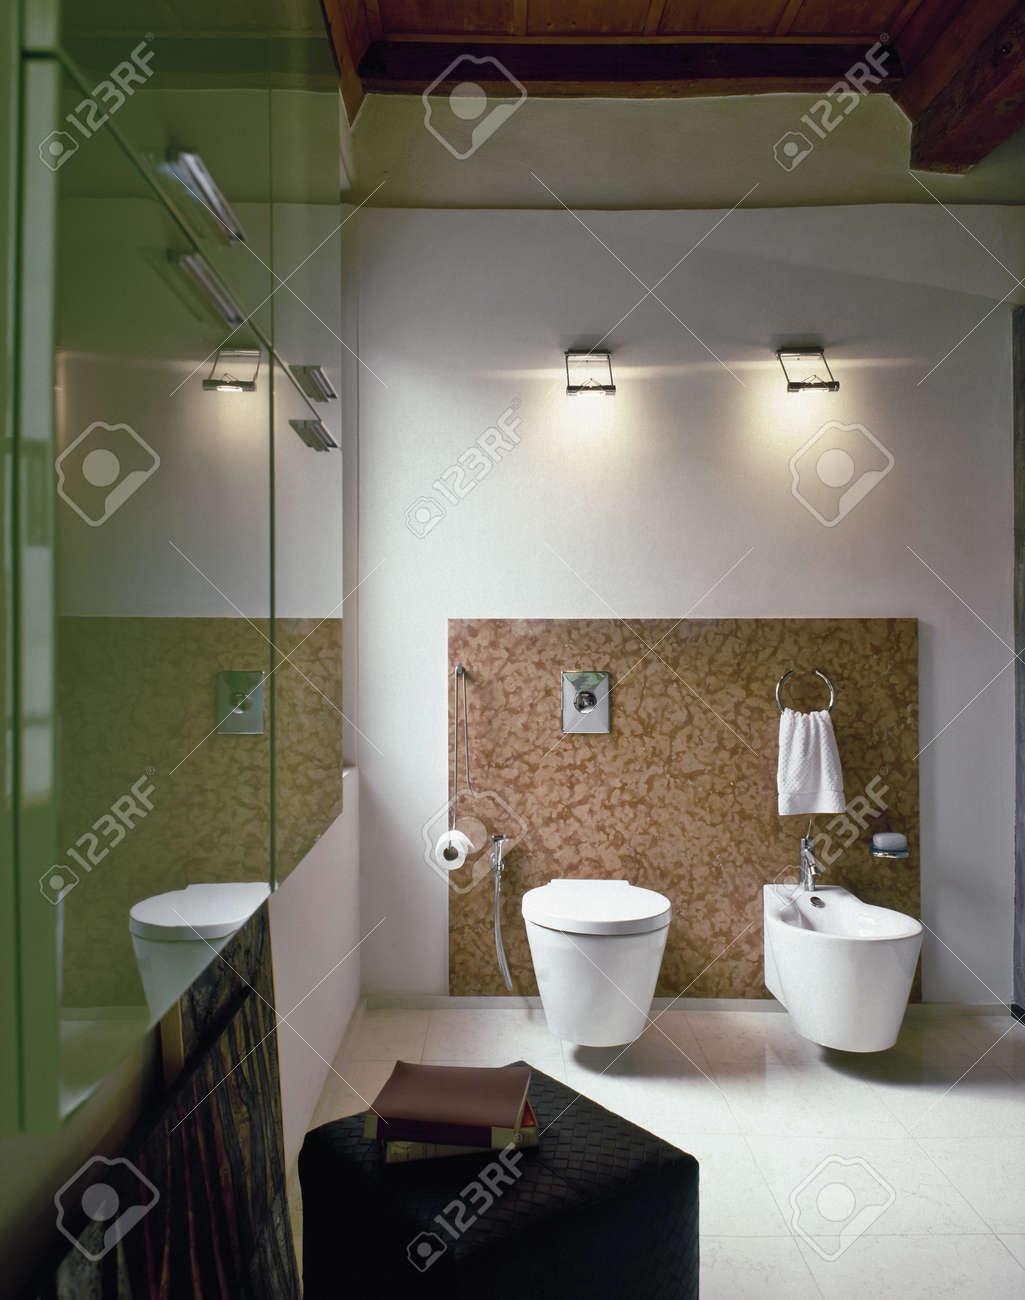 sanitary ware in a modern bathroom Stock Photo - 13615114